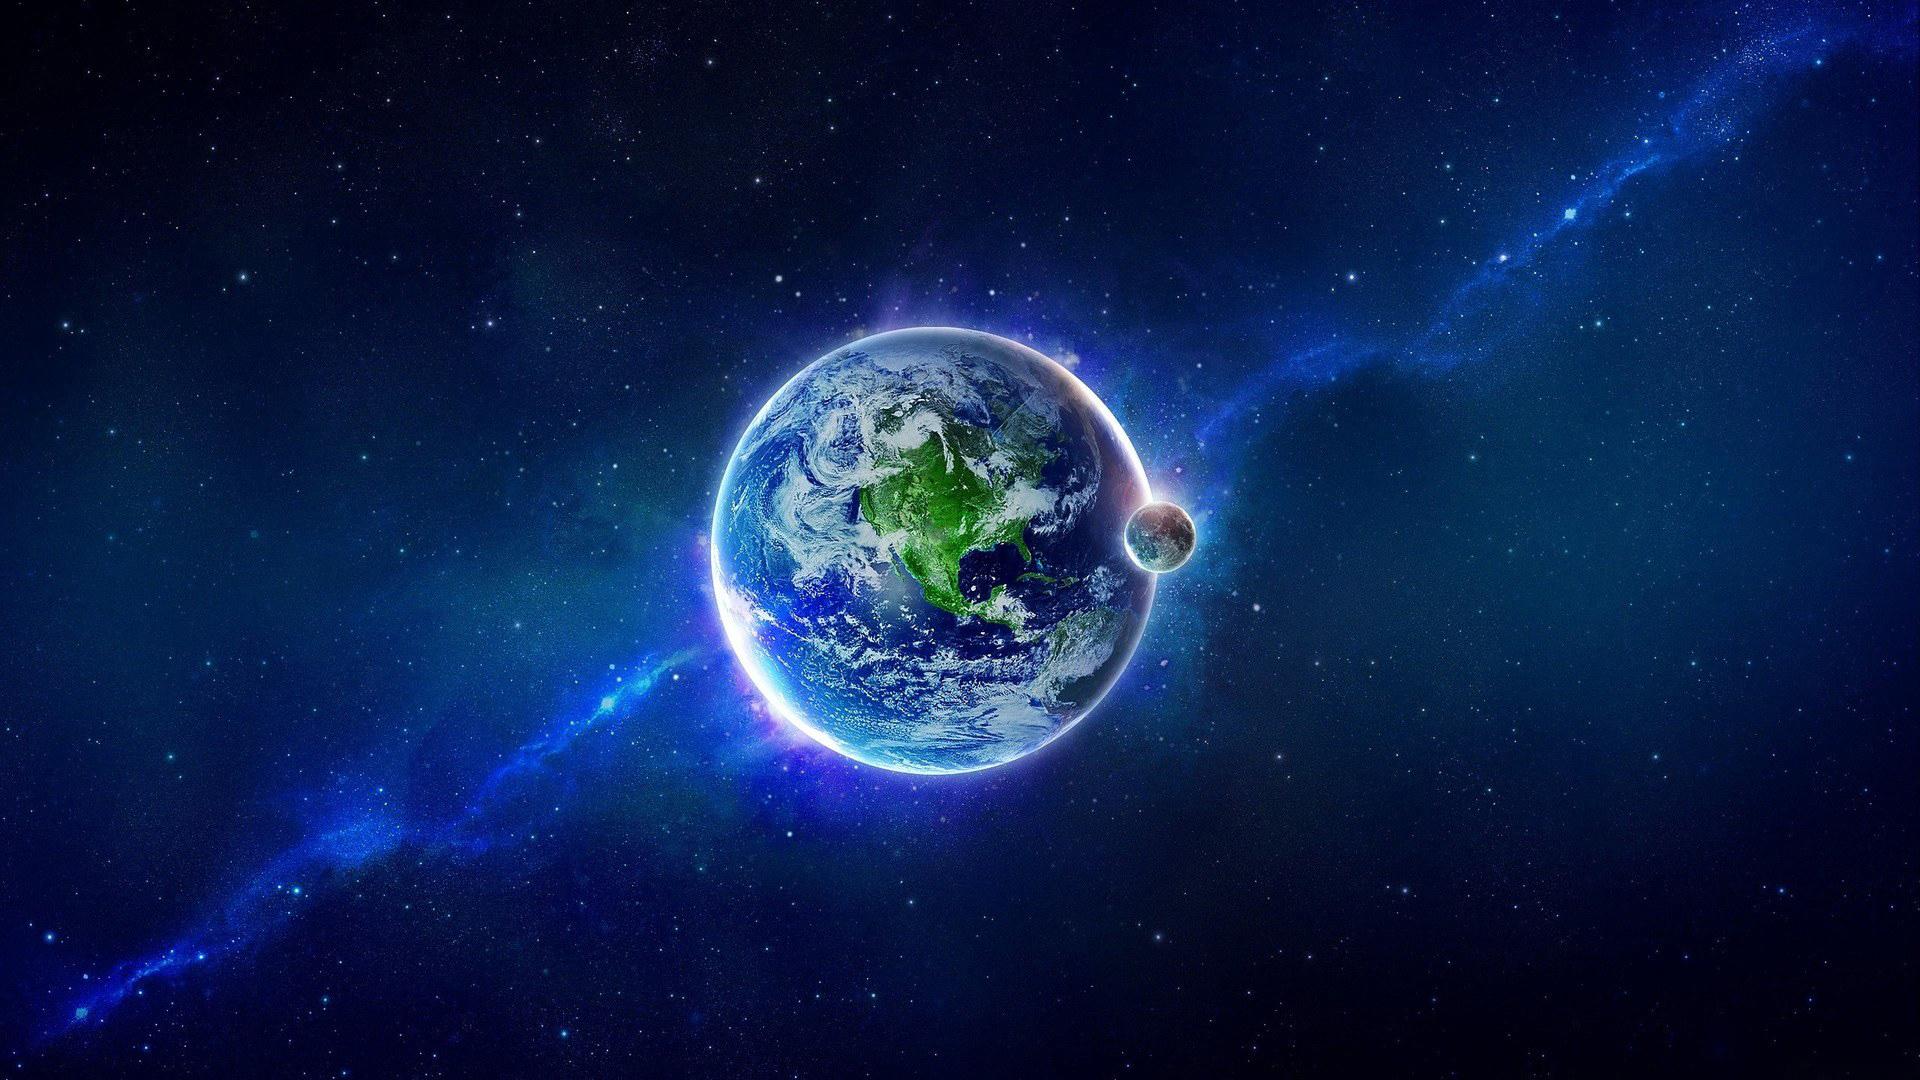 Space Wallpaper Blue Stars Planet Full Hd Earth Hd 1530567